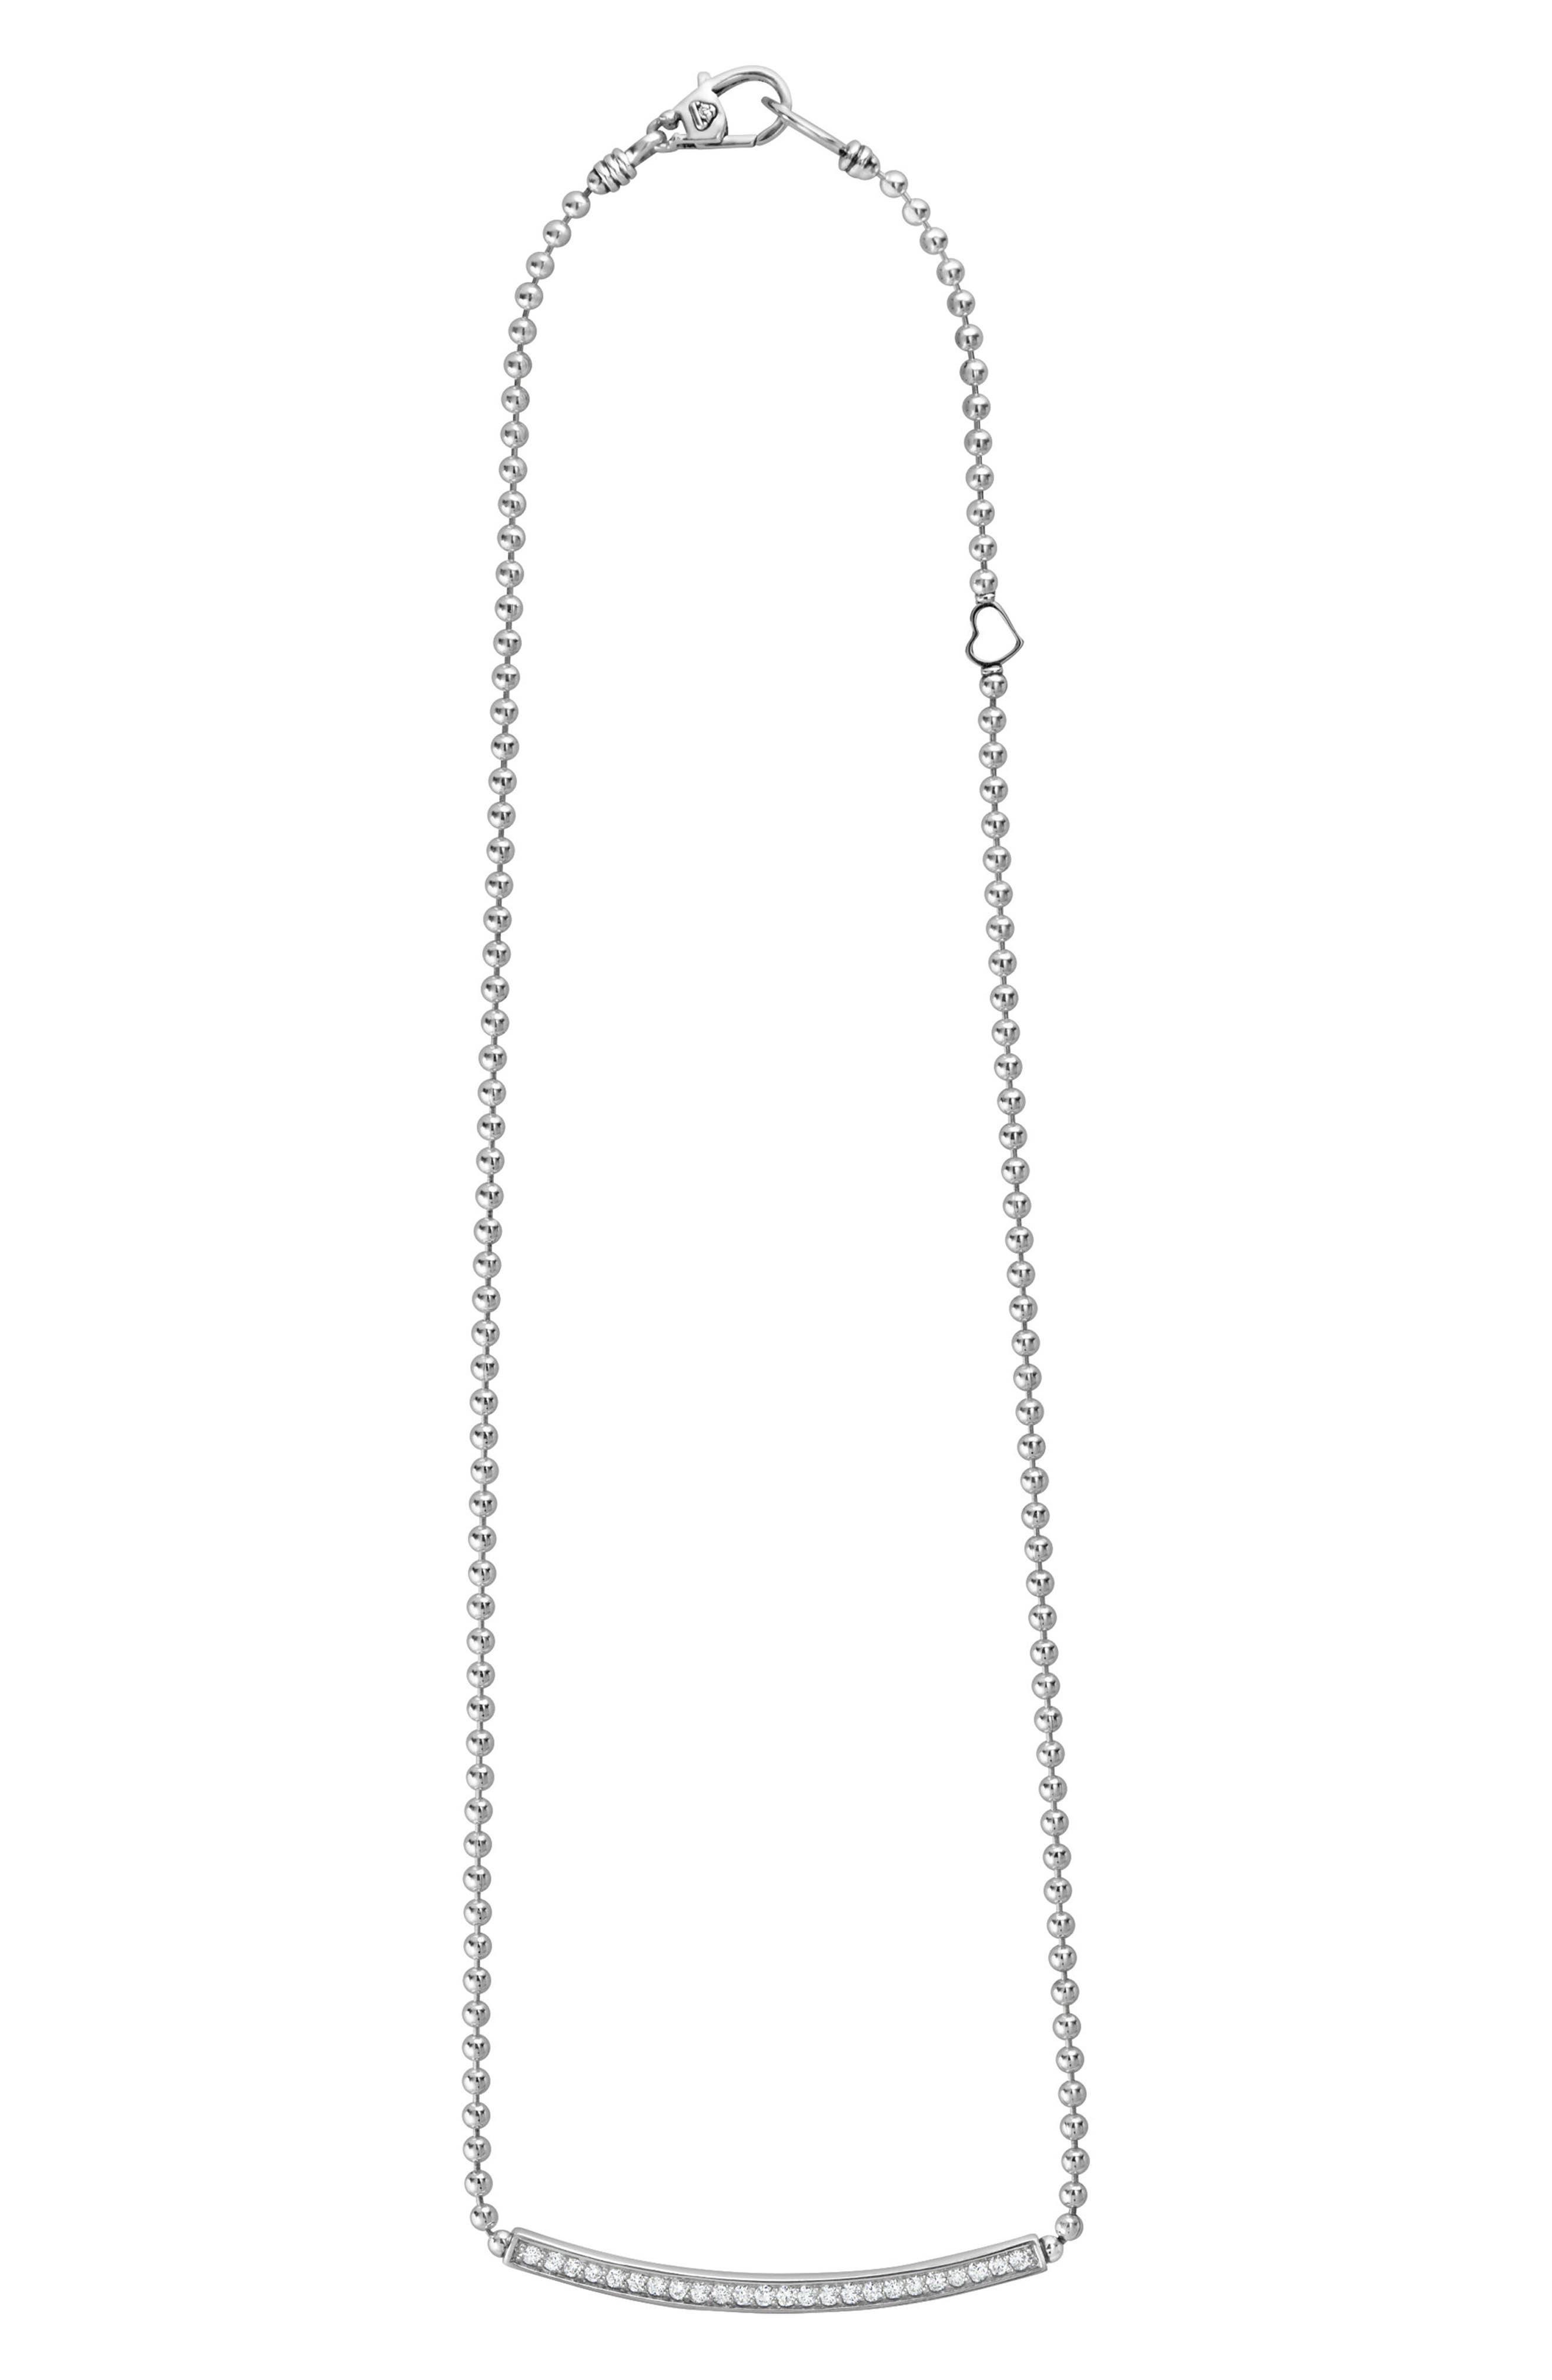 LAGOS Caviar Spark Diamond Bar Necklace